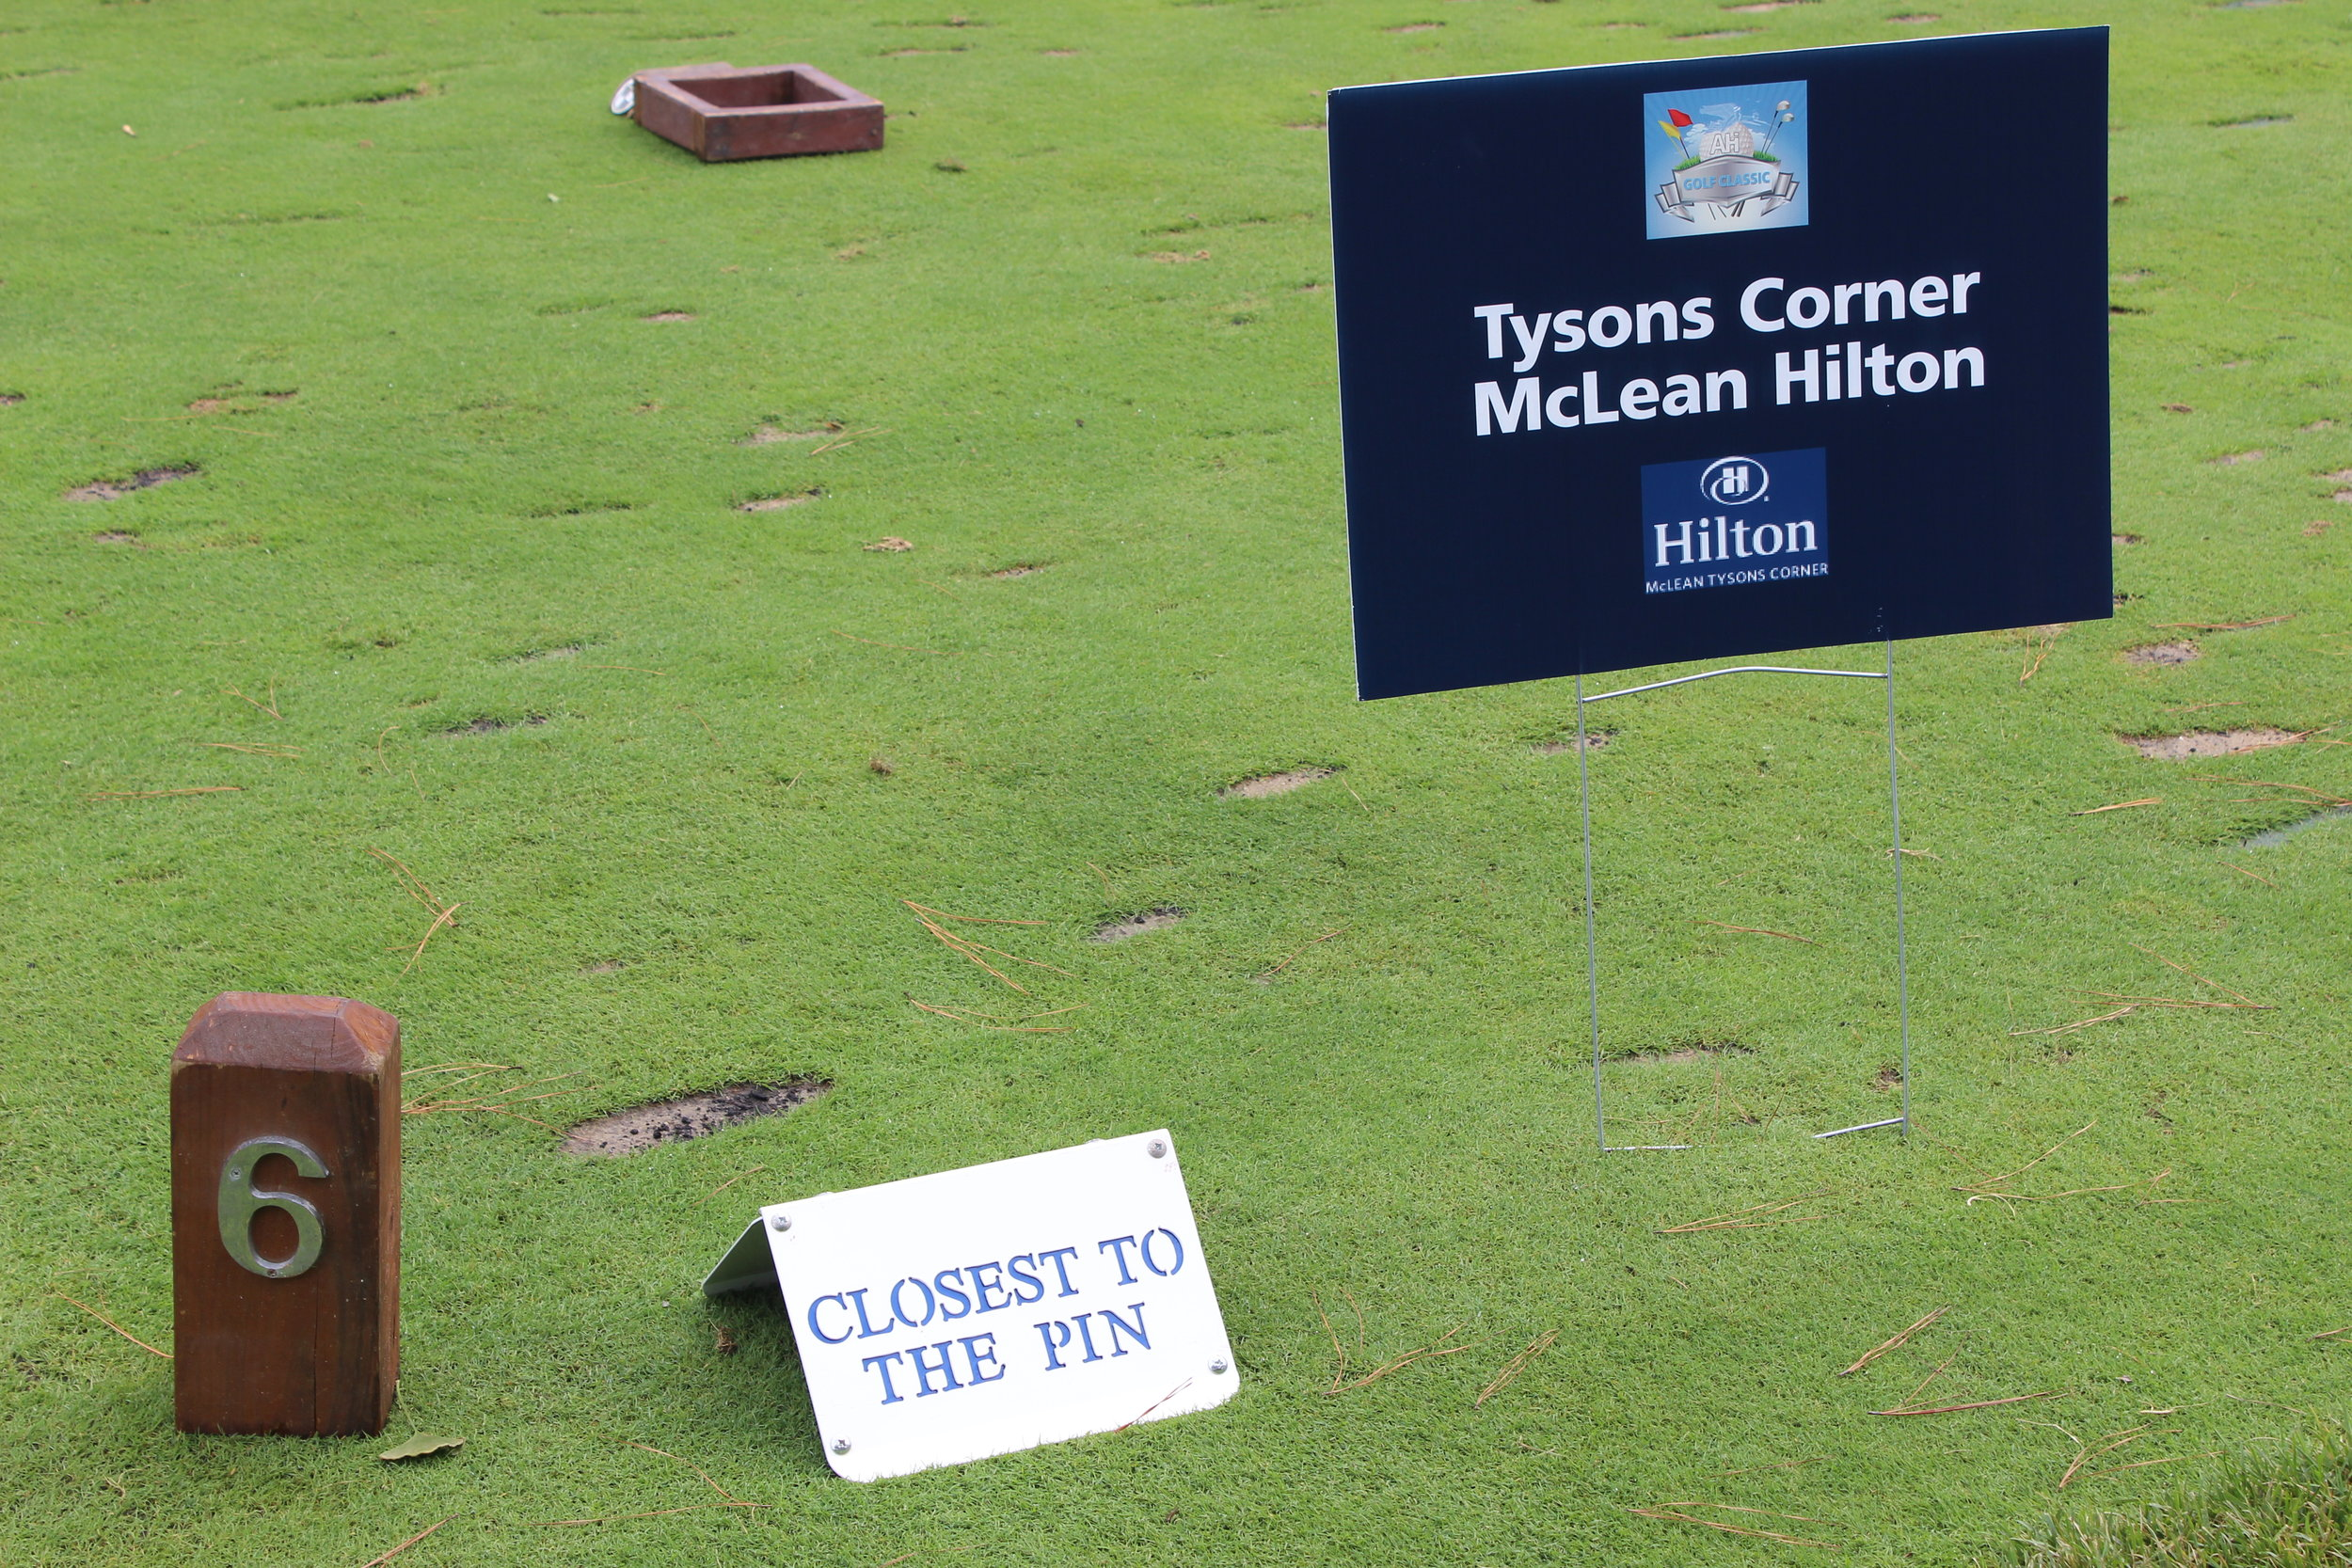 Tyson's Corner McLean Hilton, Hole Sponsor.